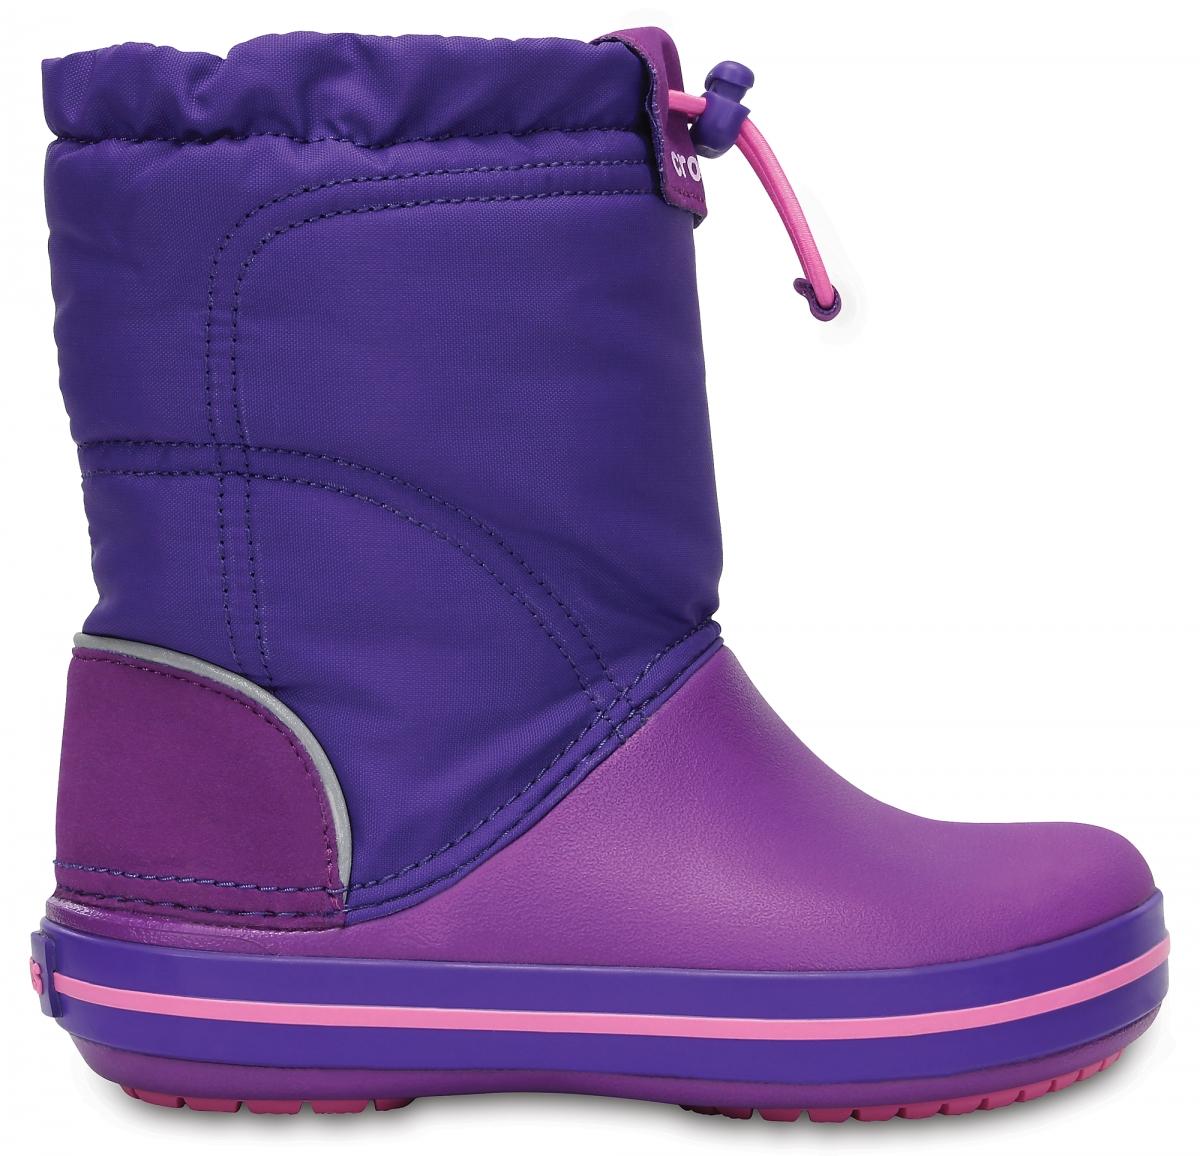 Crocs Crocband LodgePoint Boot Kids - Amethyst/Ultraviolet, C13 (30-31)